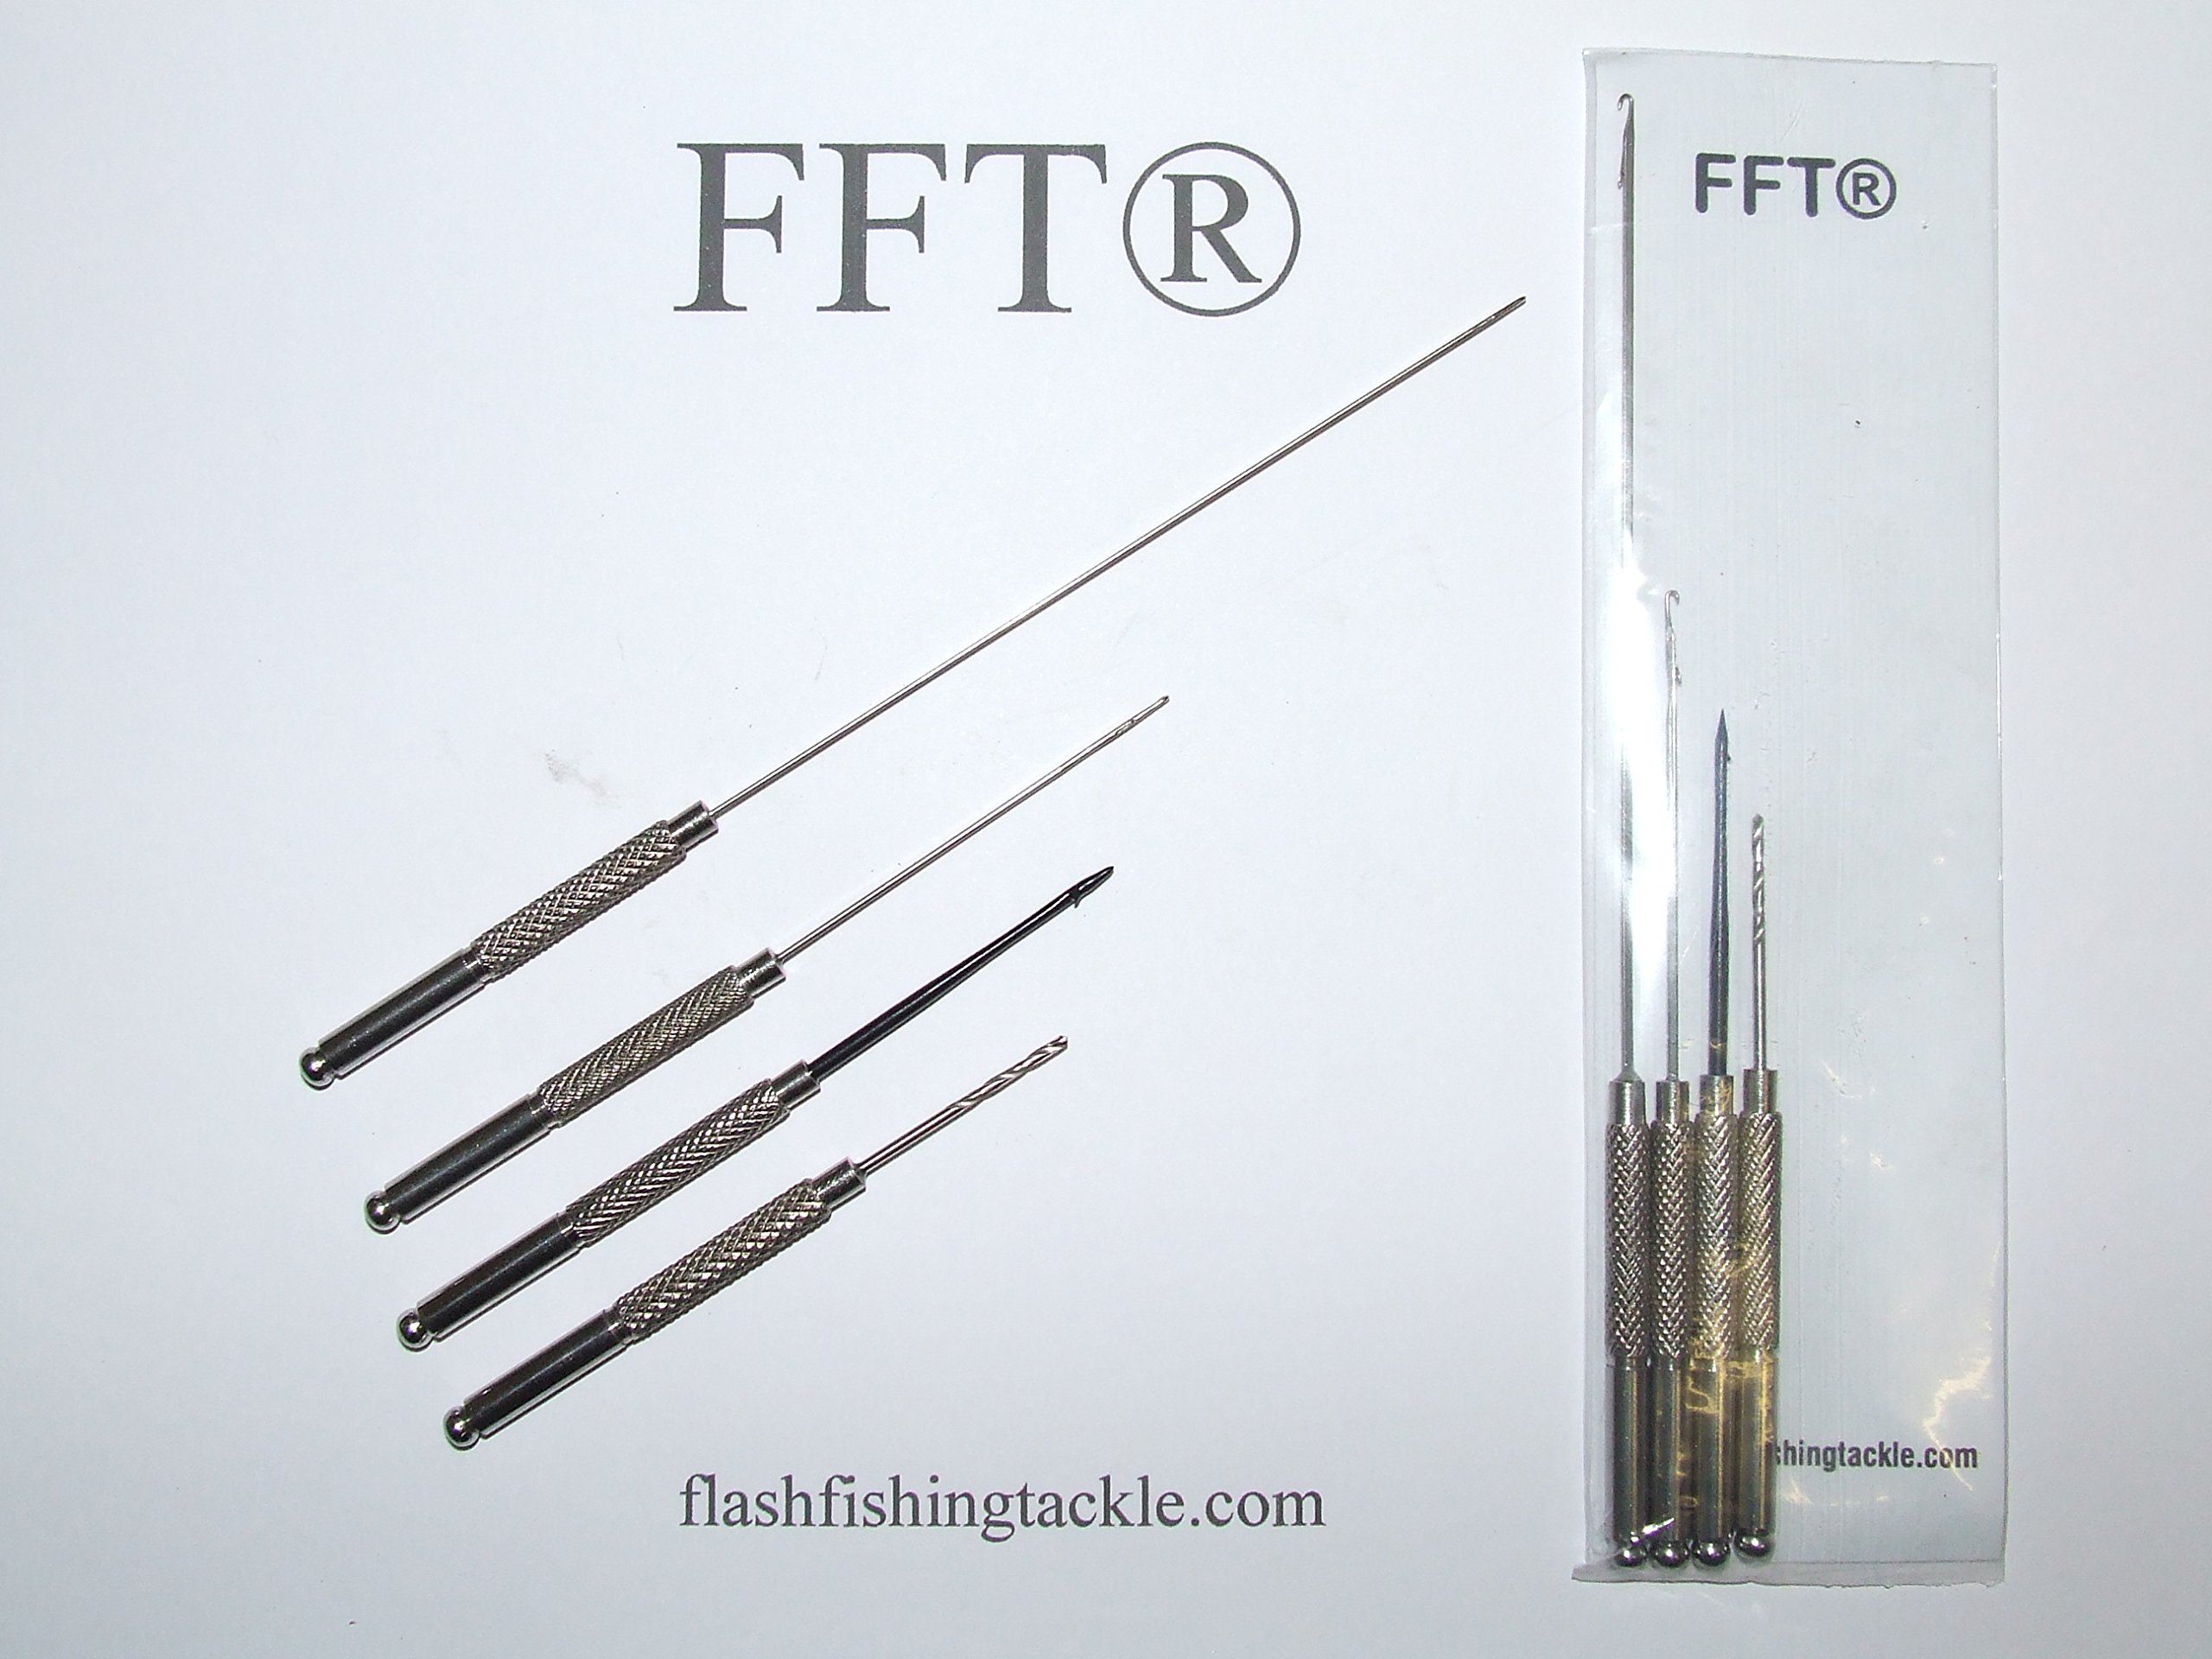 Ngt Baiting Needle /& Braid Scissor Set 6 x Pieces